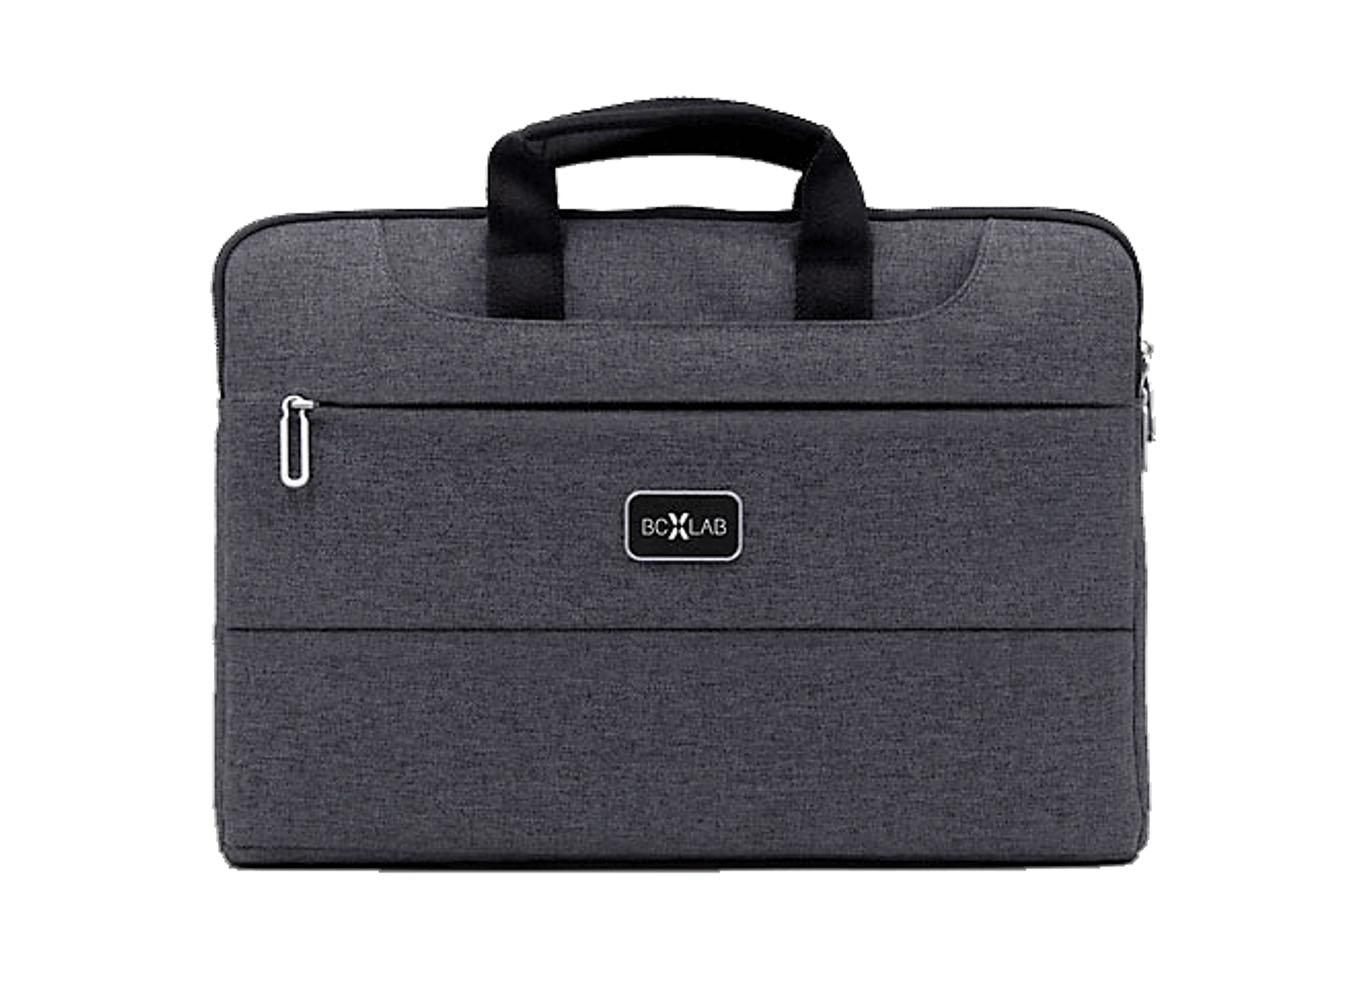 Regent Laptop Bag